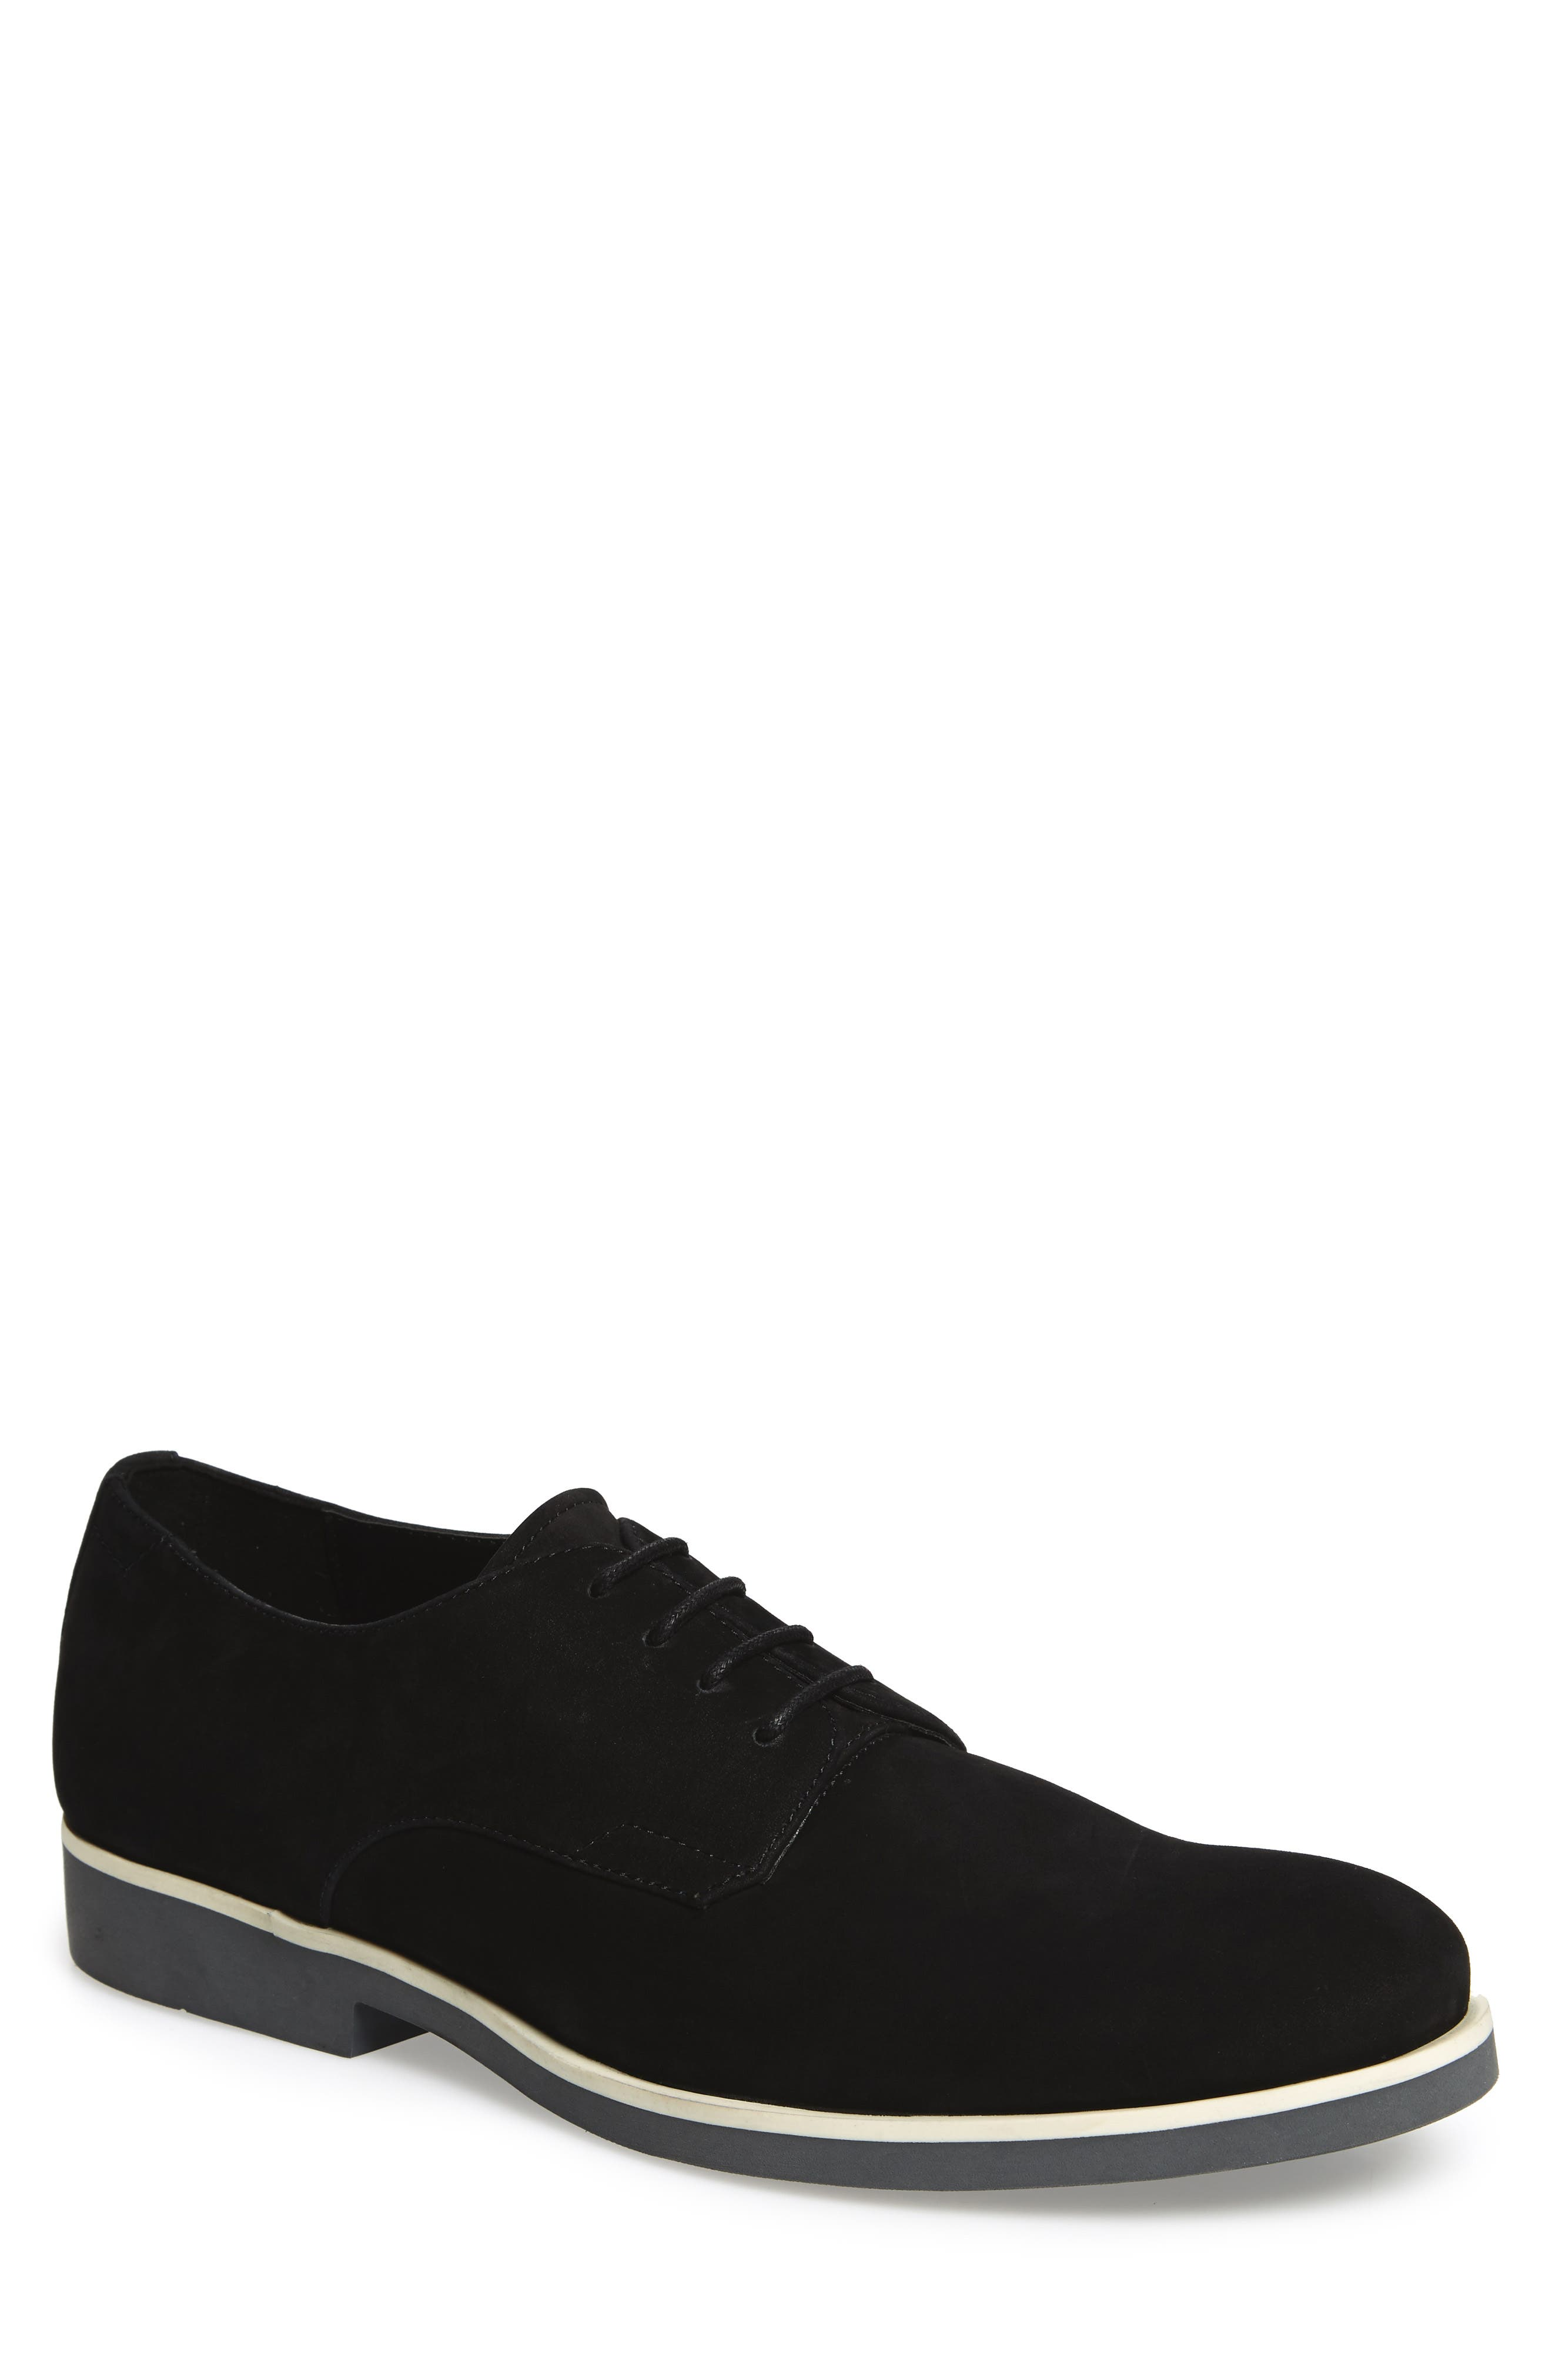 Faustino Plain-Toe Oxford,                             Main thumbnail 1, color,                             Black Leather